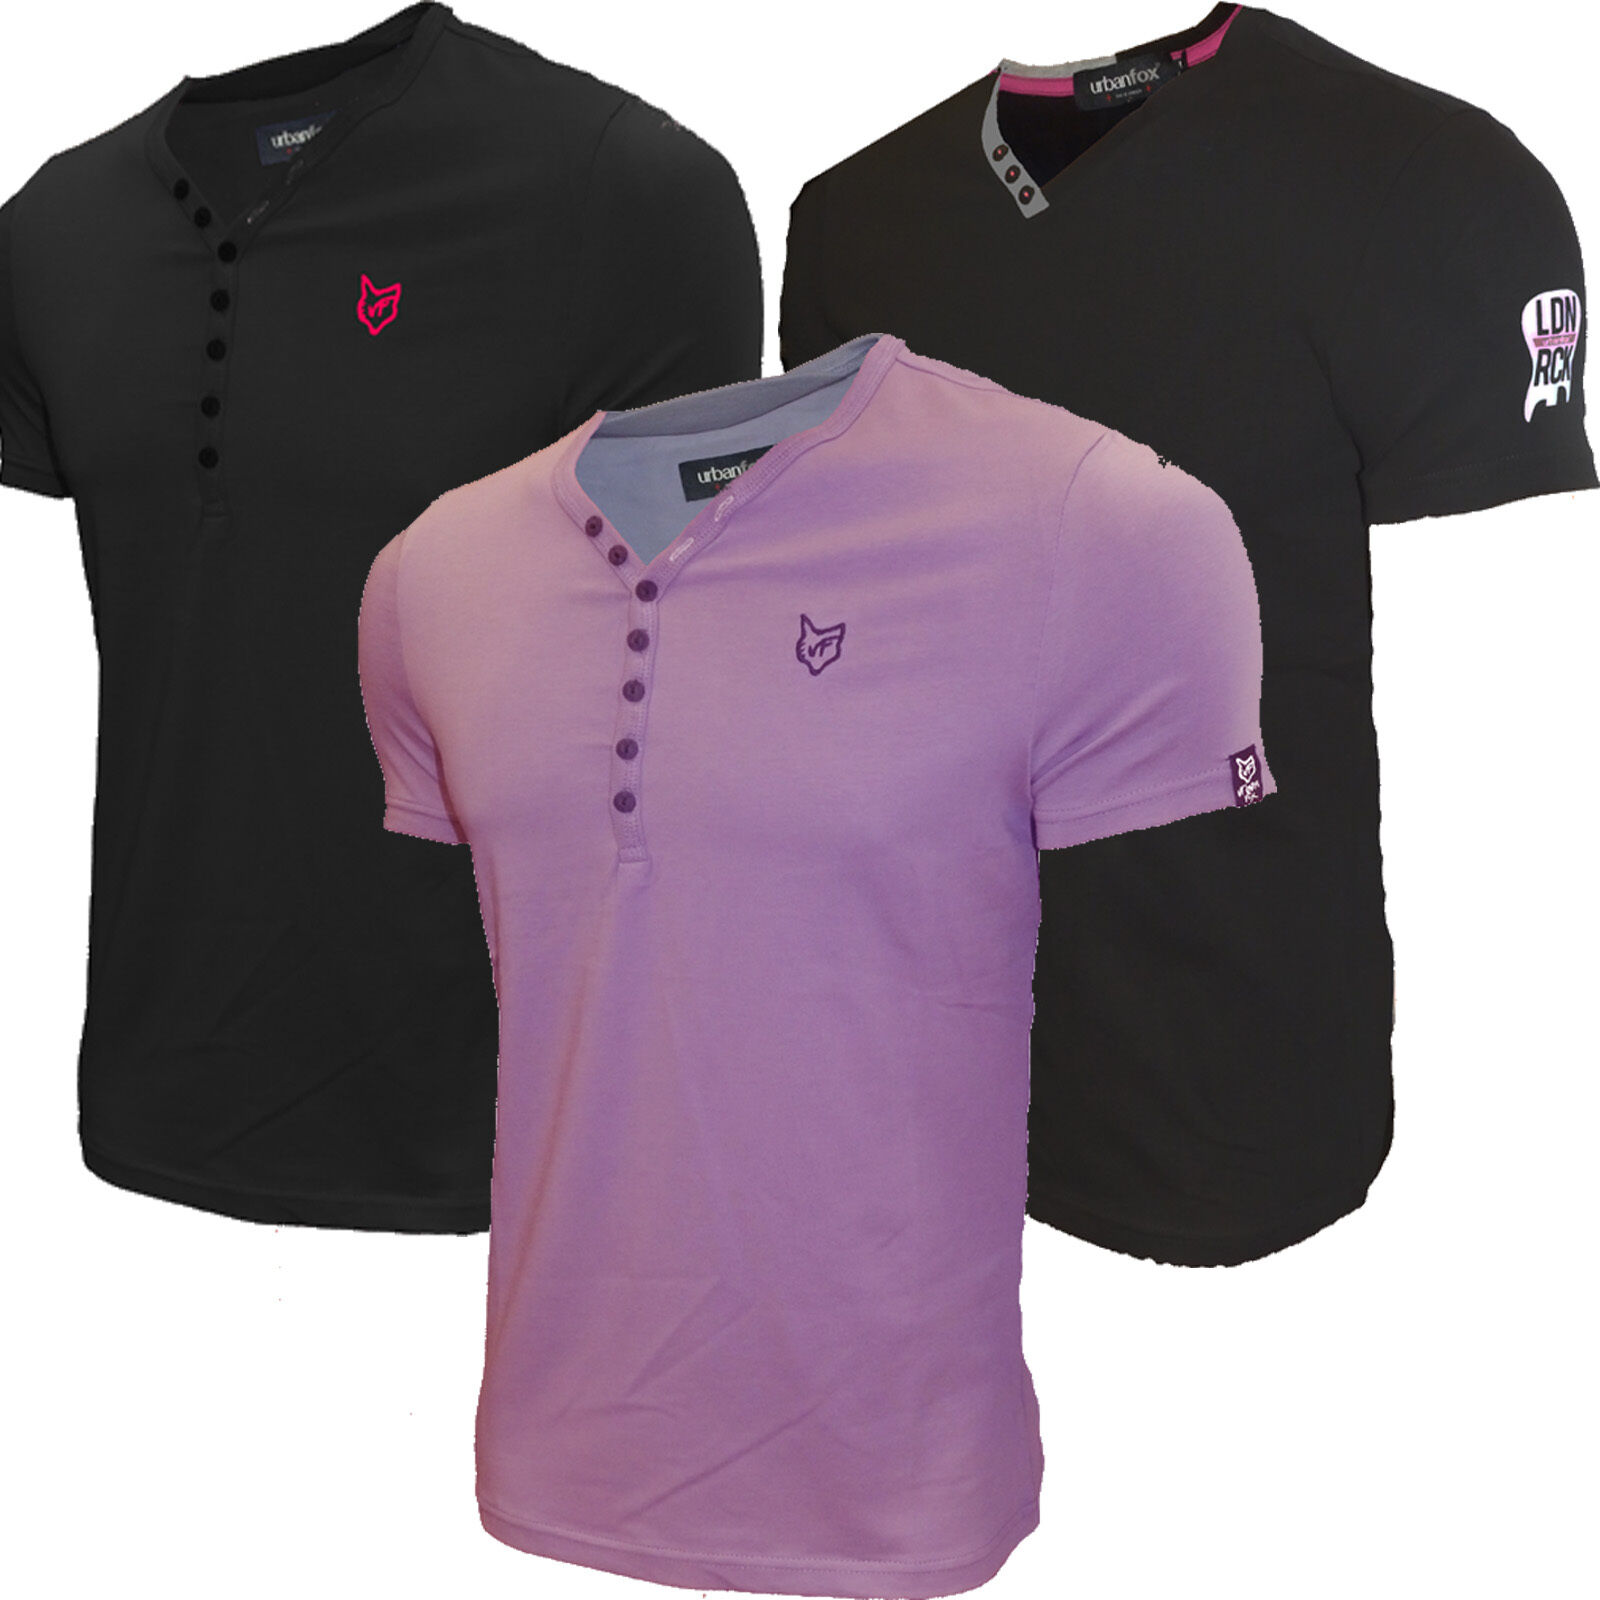 Mens Polo Shirt Slim Fit Urban Fox Short Sleeve Top New Ebay